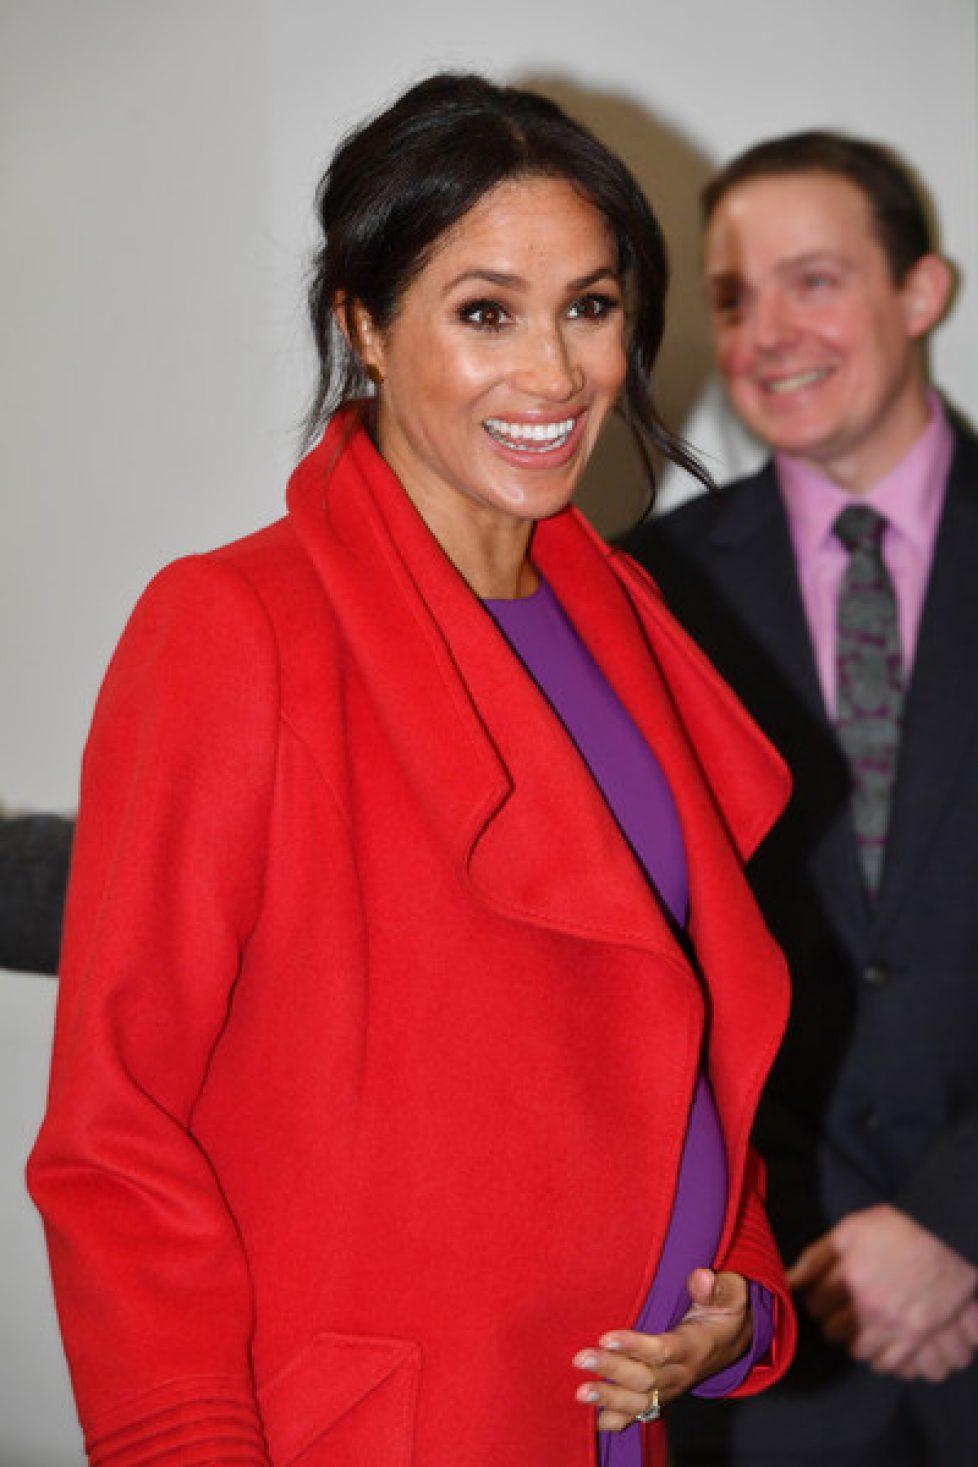 Duke+Duchess+Sussex+Visit+Birkenhead+he8a9t_ulDTl